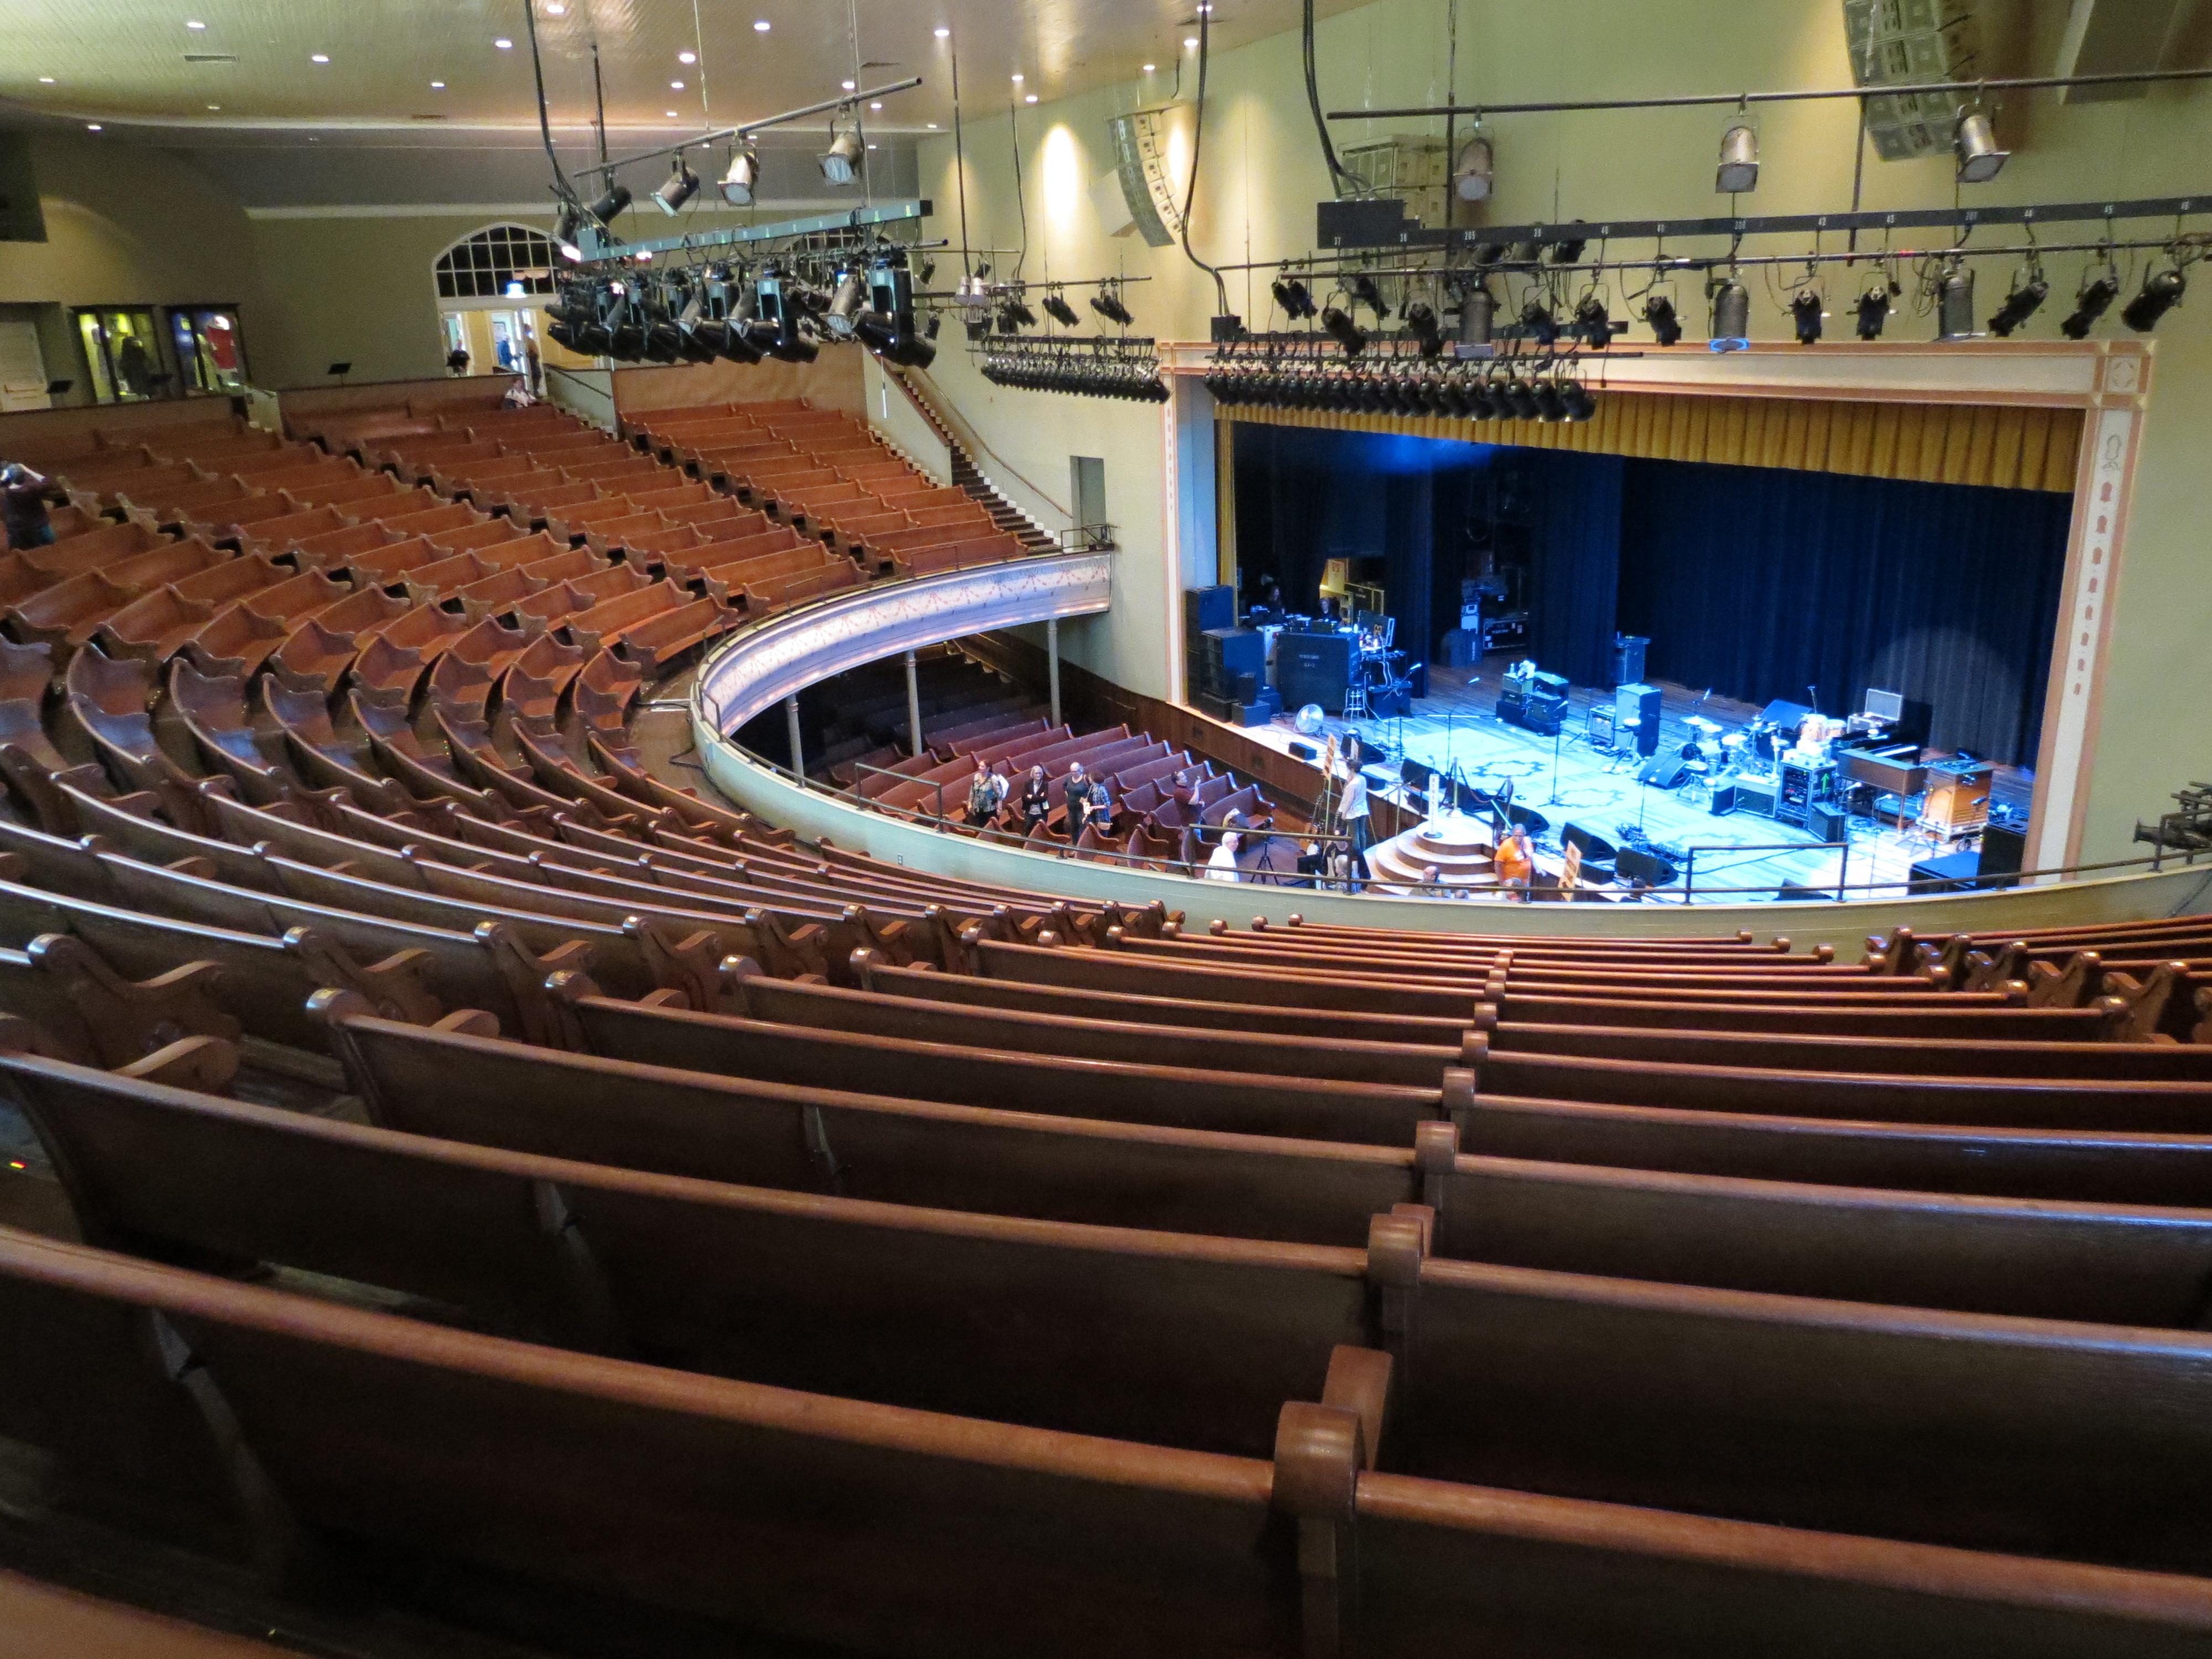 Nashville Ryman Auditorium Country Music Hall Of Fame